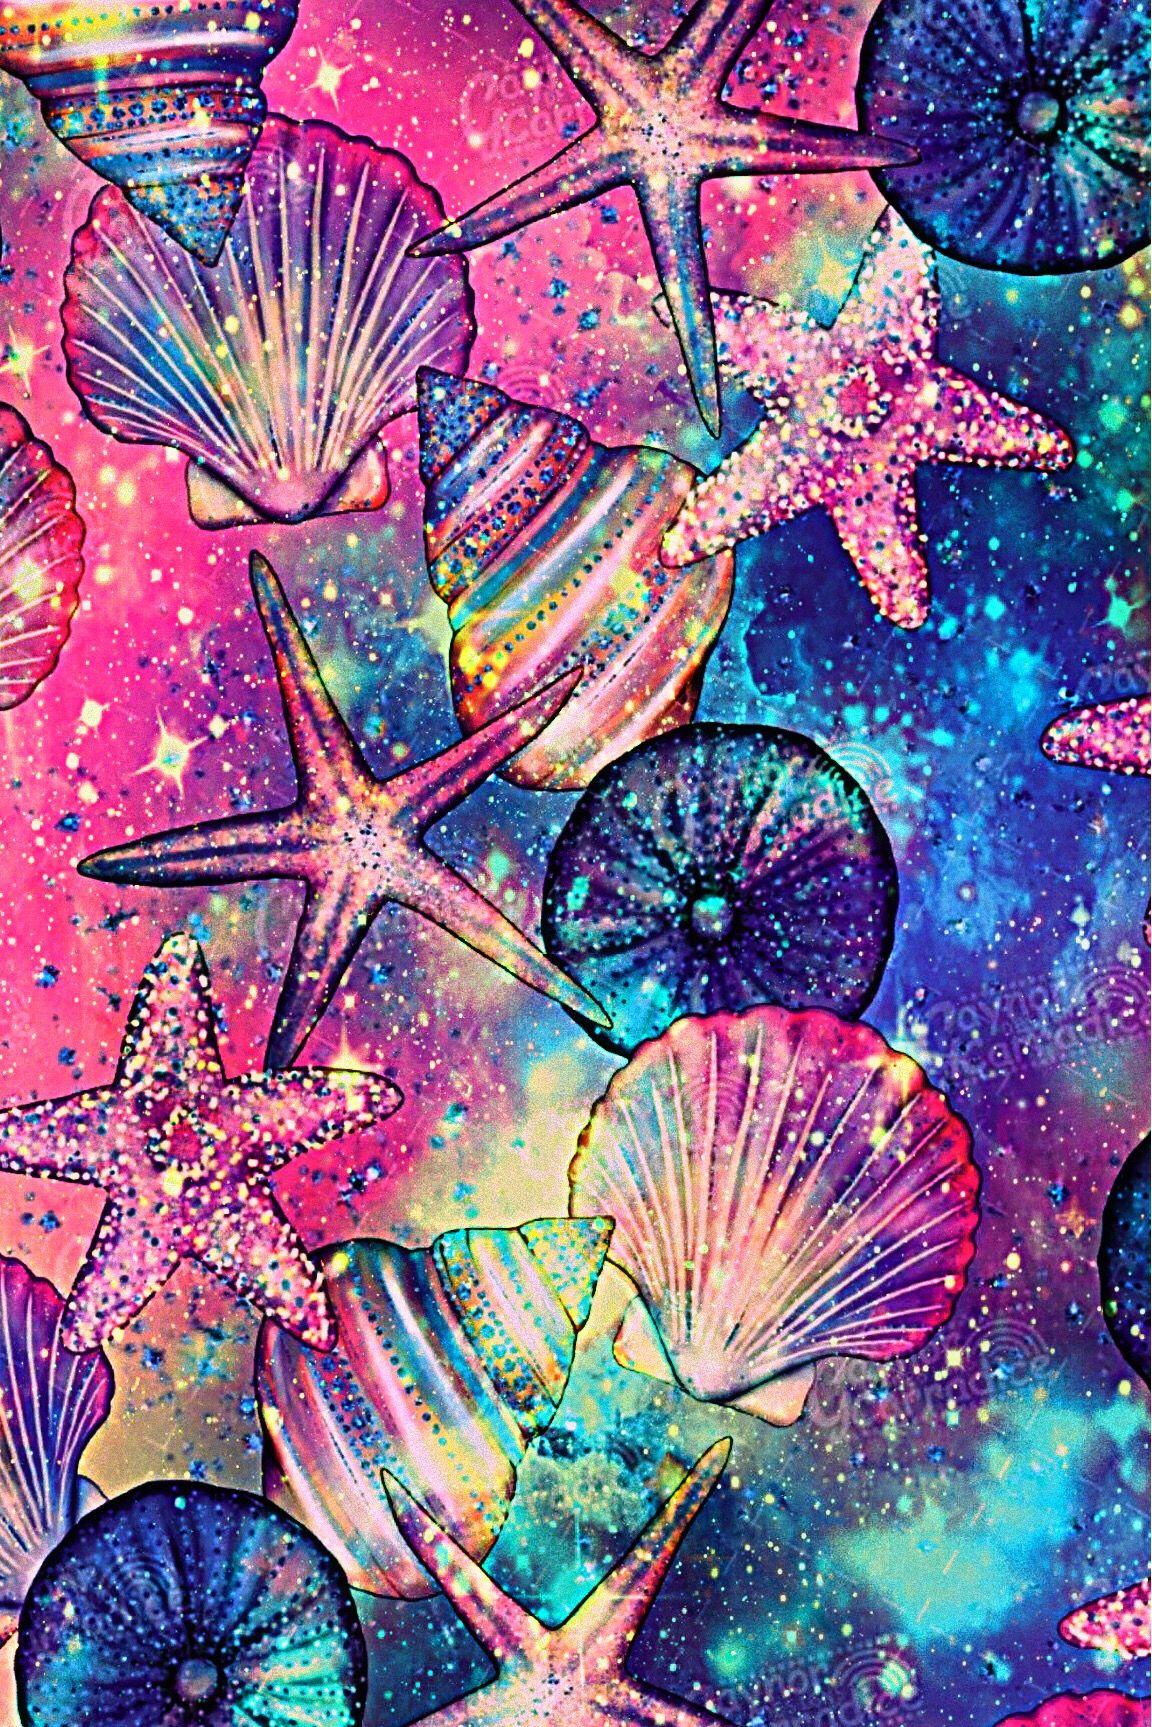 Wallpaper Lockscreen Glitter Sparkle Galaxy Summer Beach Seashells Pink Blue Colorful Wallpaper Pink Cute Cat Phone Wallpaper Wallpaper Iphone Love